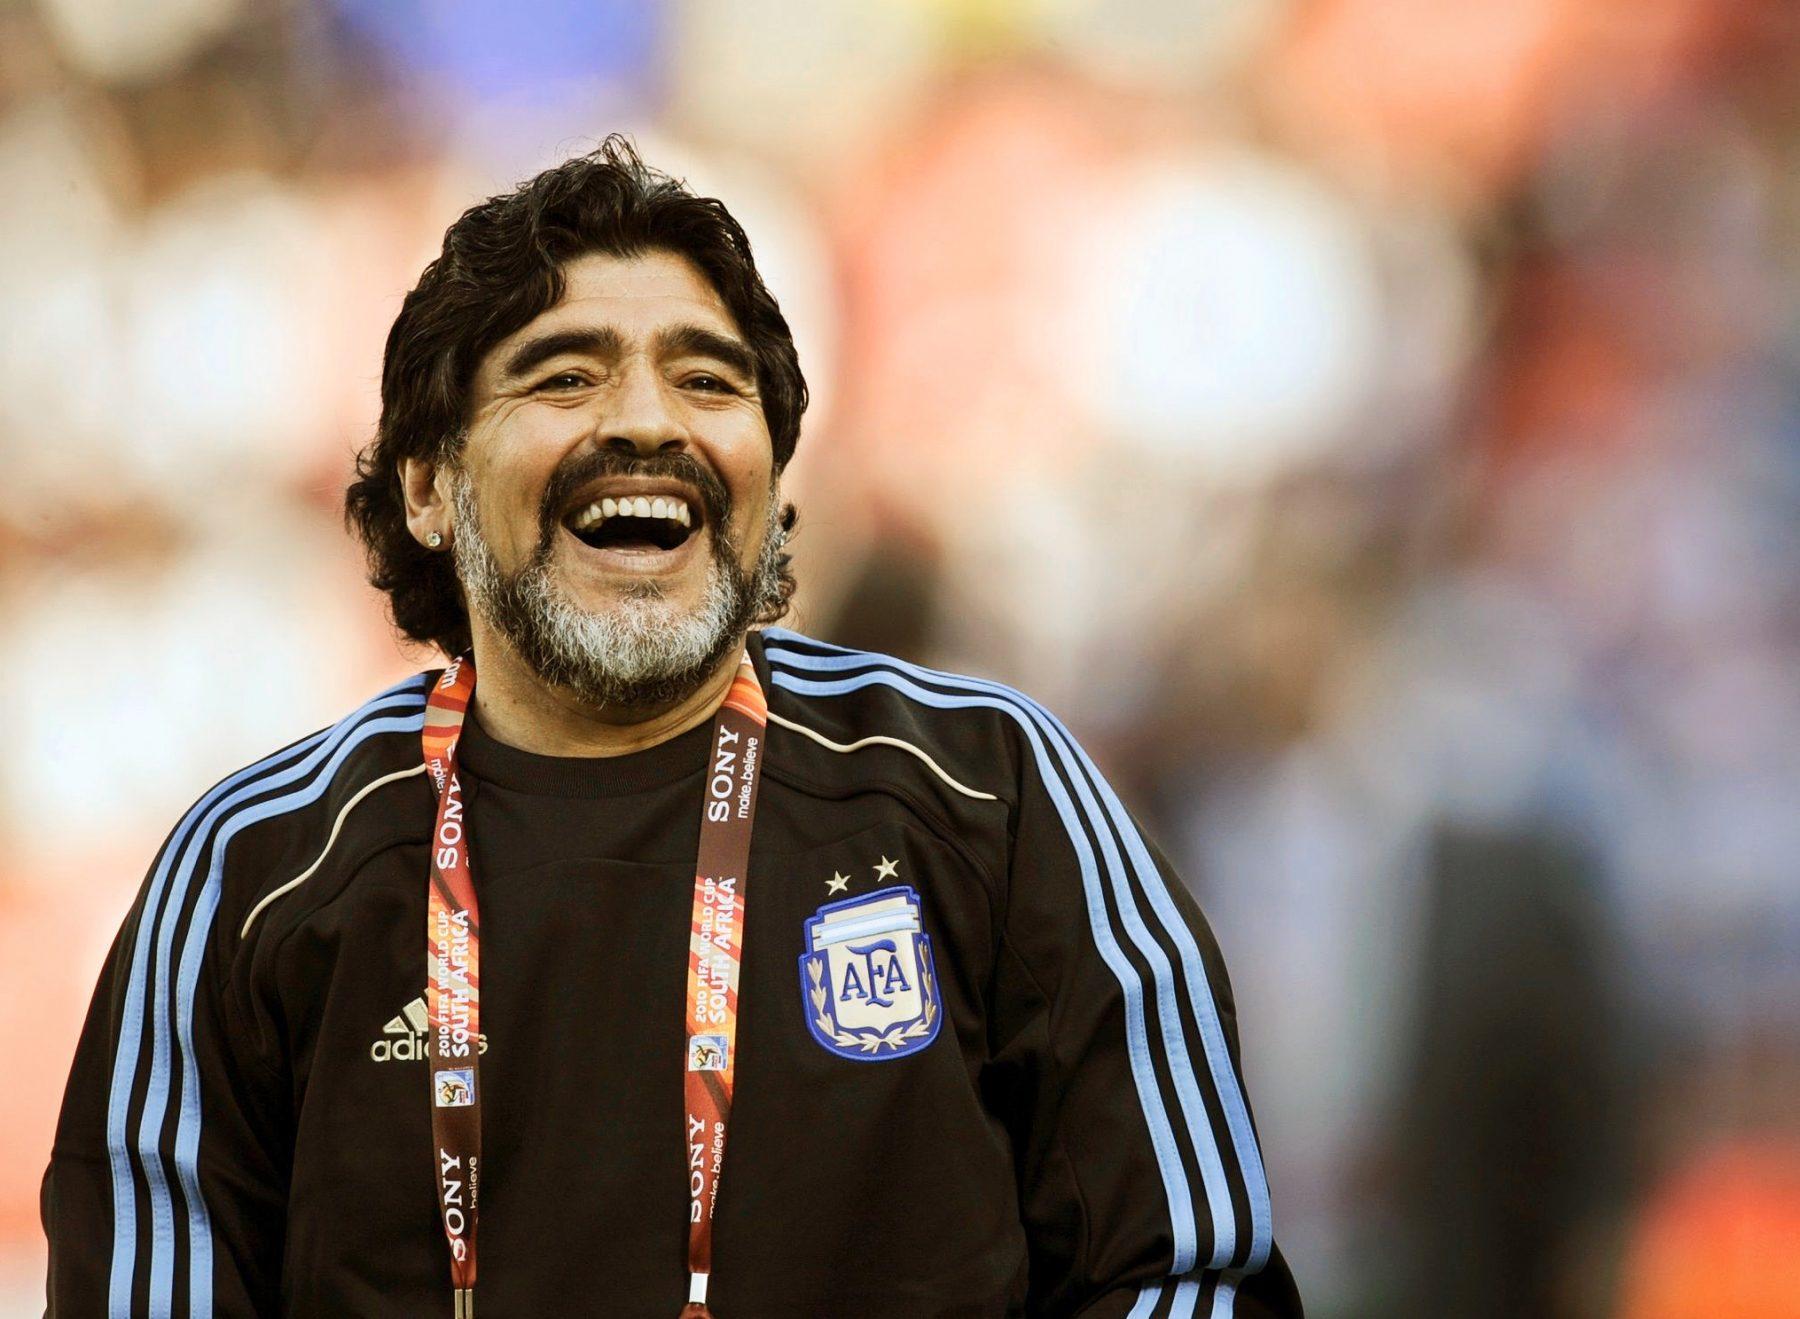 Diego Maradona Argentina manager died